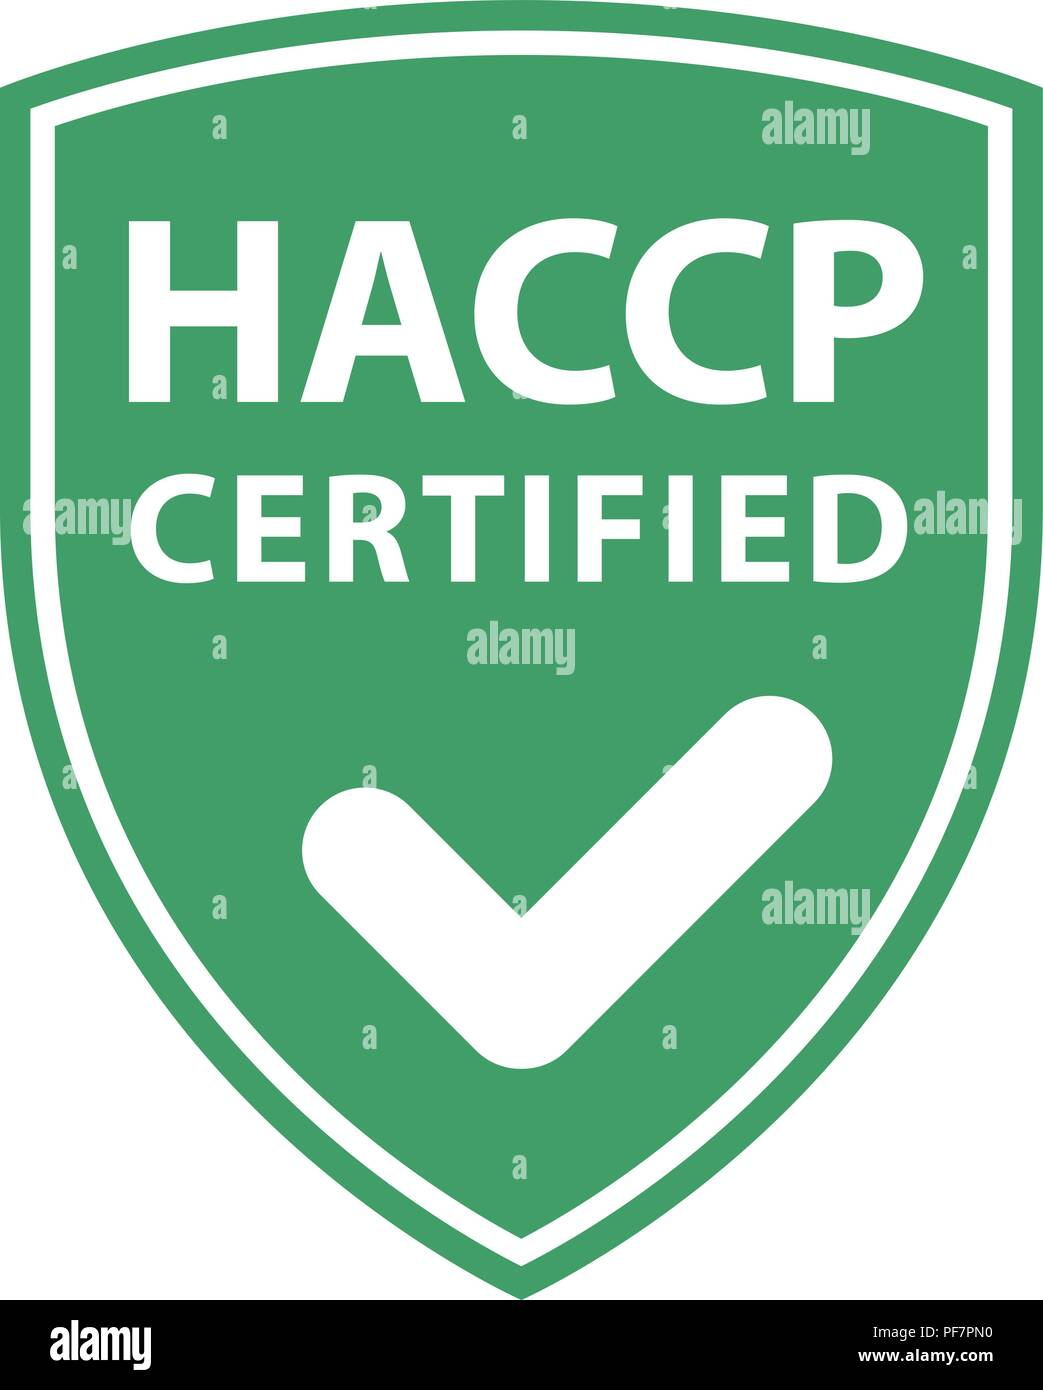 Haccp Stock Photos & Haccp Stock Images - Alamy